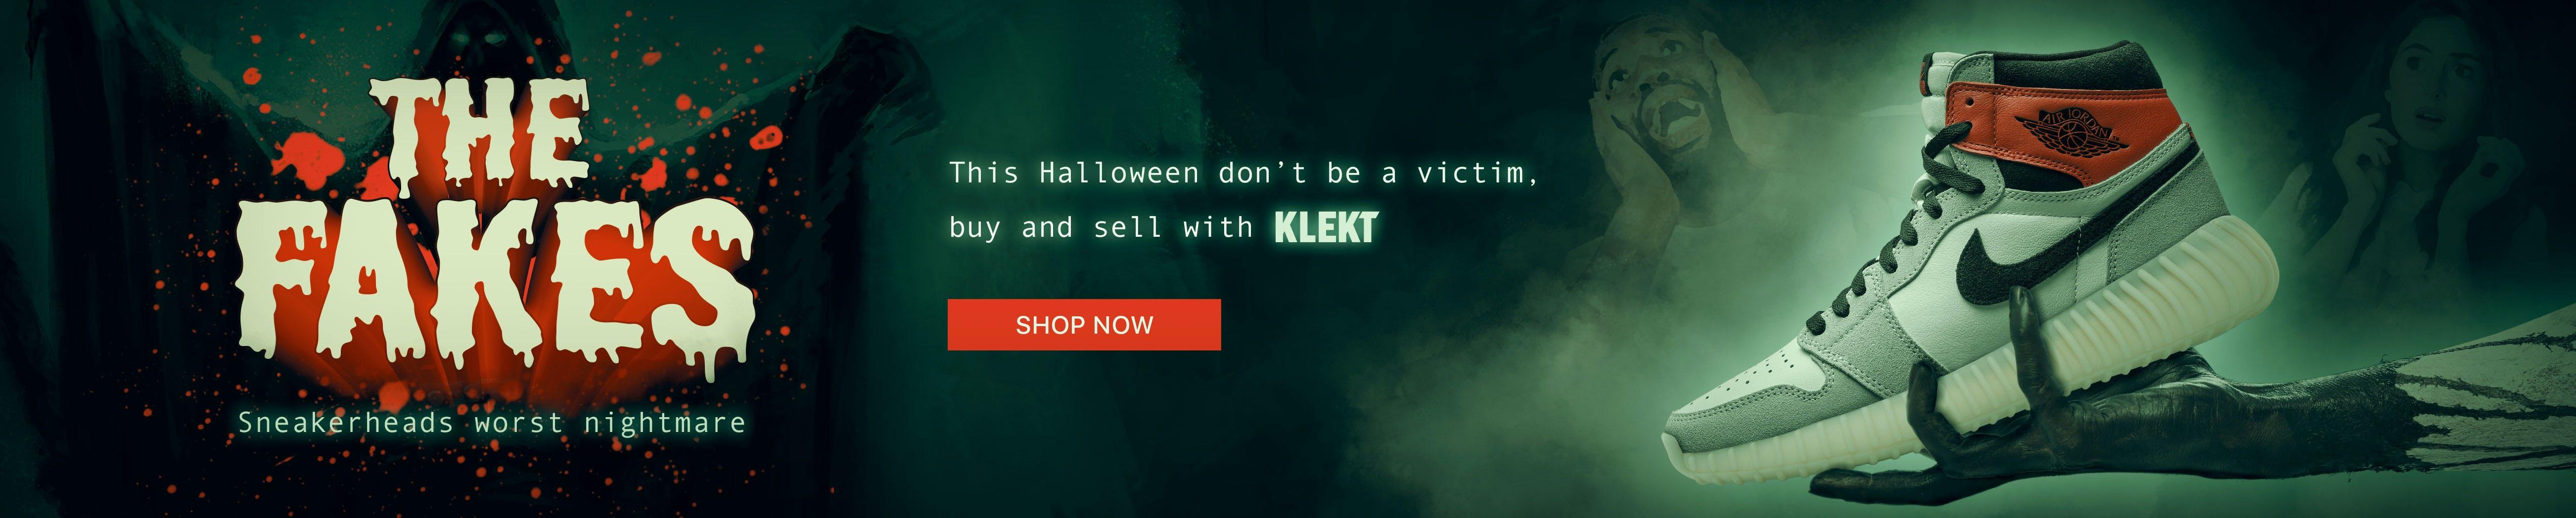 Halloween Sneakers Fakes Hype KLEKT